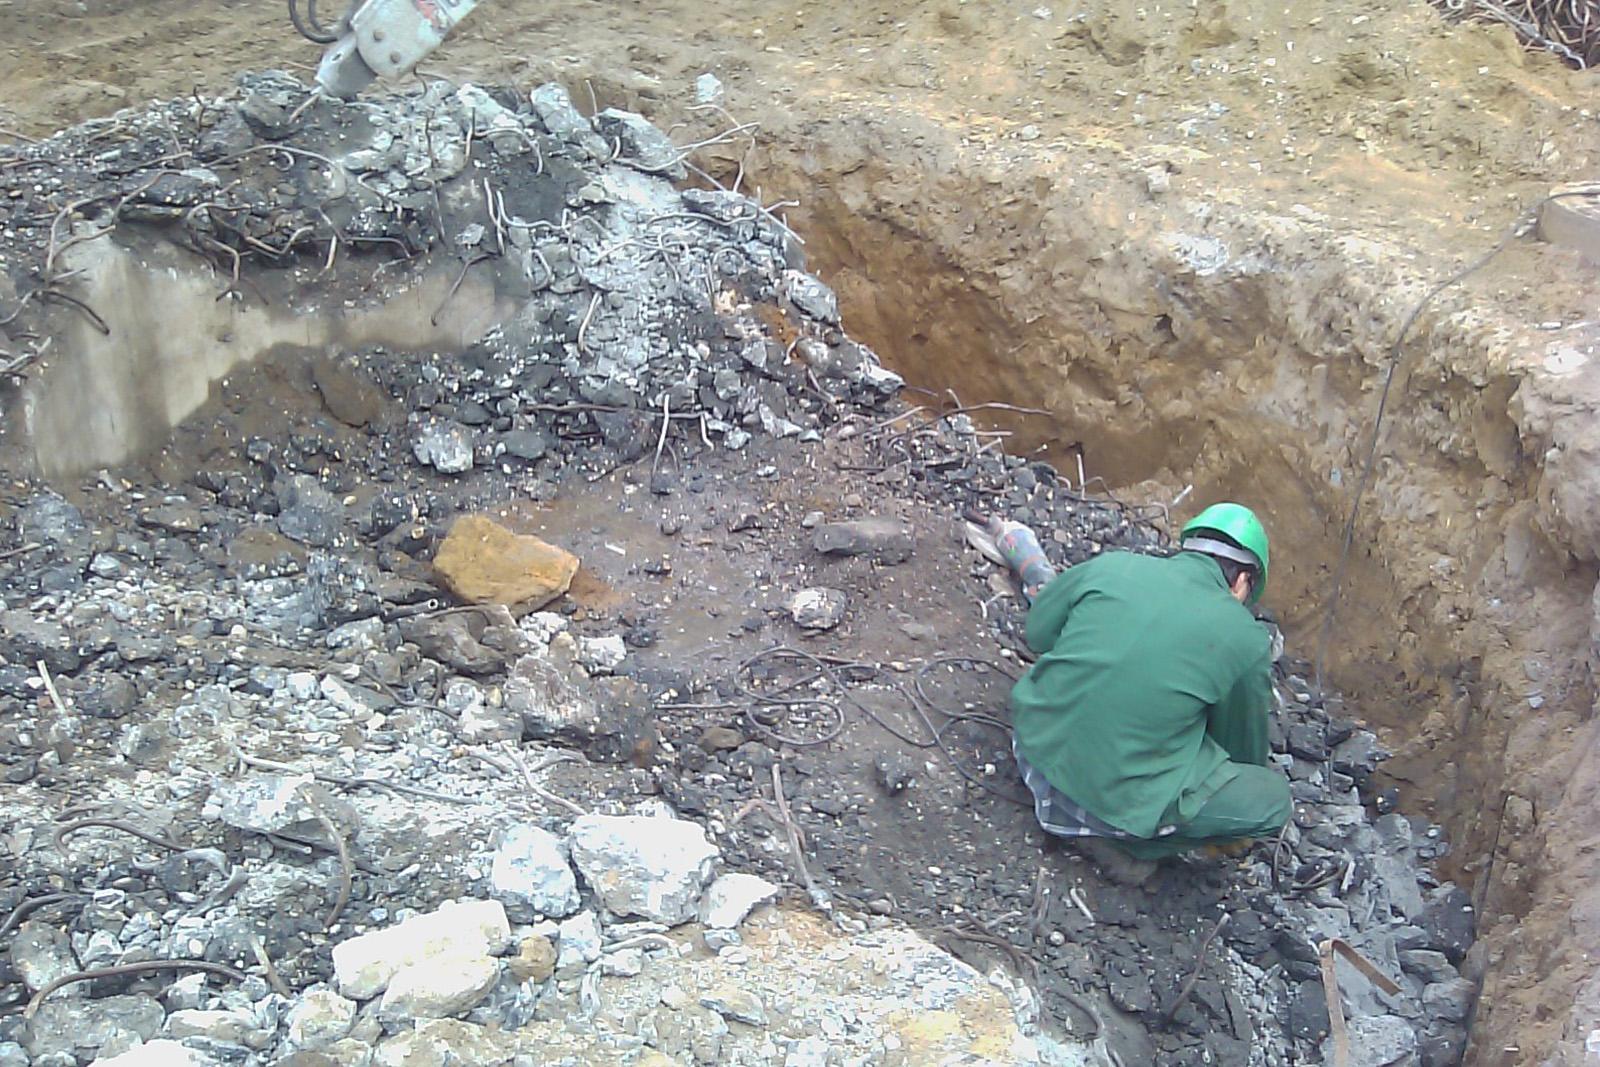 Abbruch Bunker in sensiblem Bereich · Marl